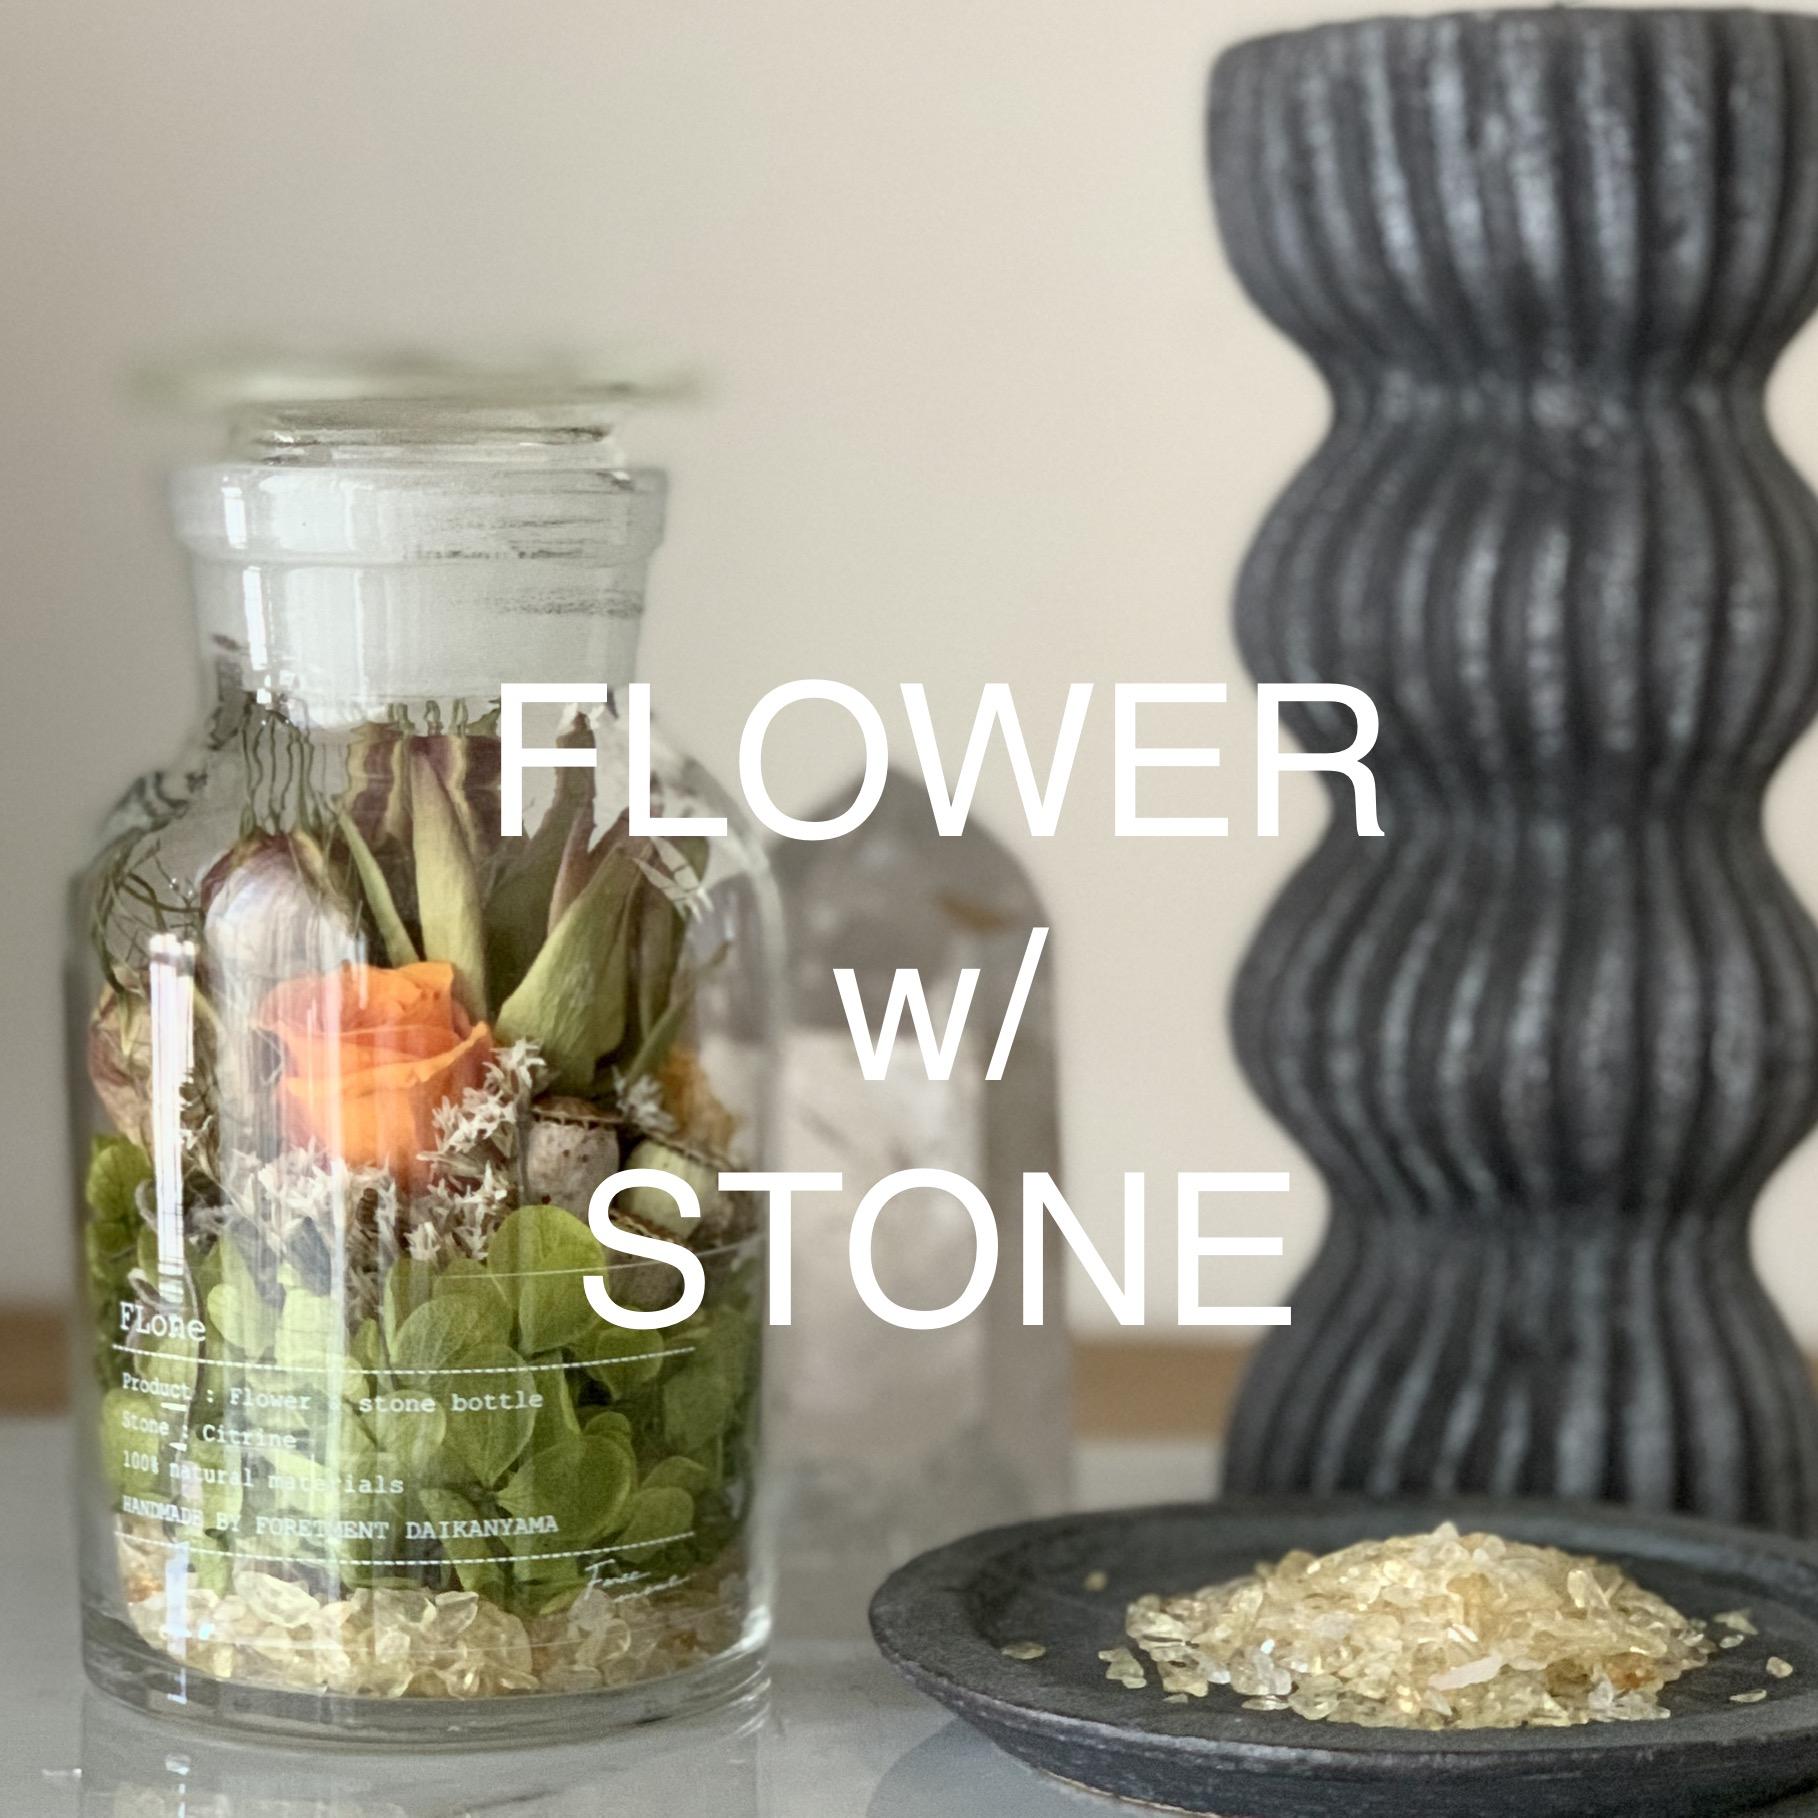 foretment(スプレイ)商品画像Floneflowerbottle-C